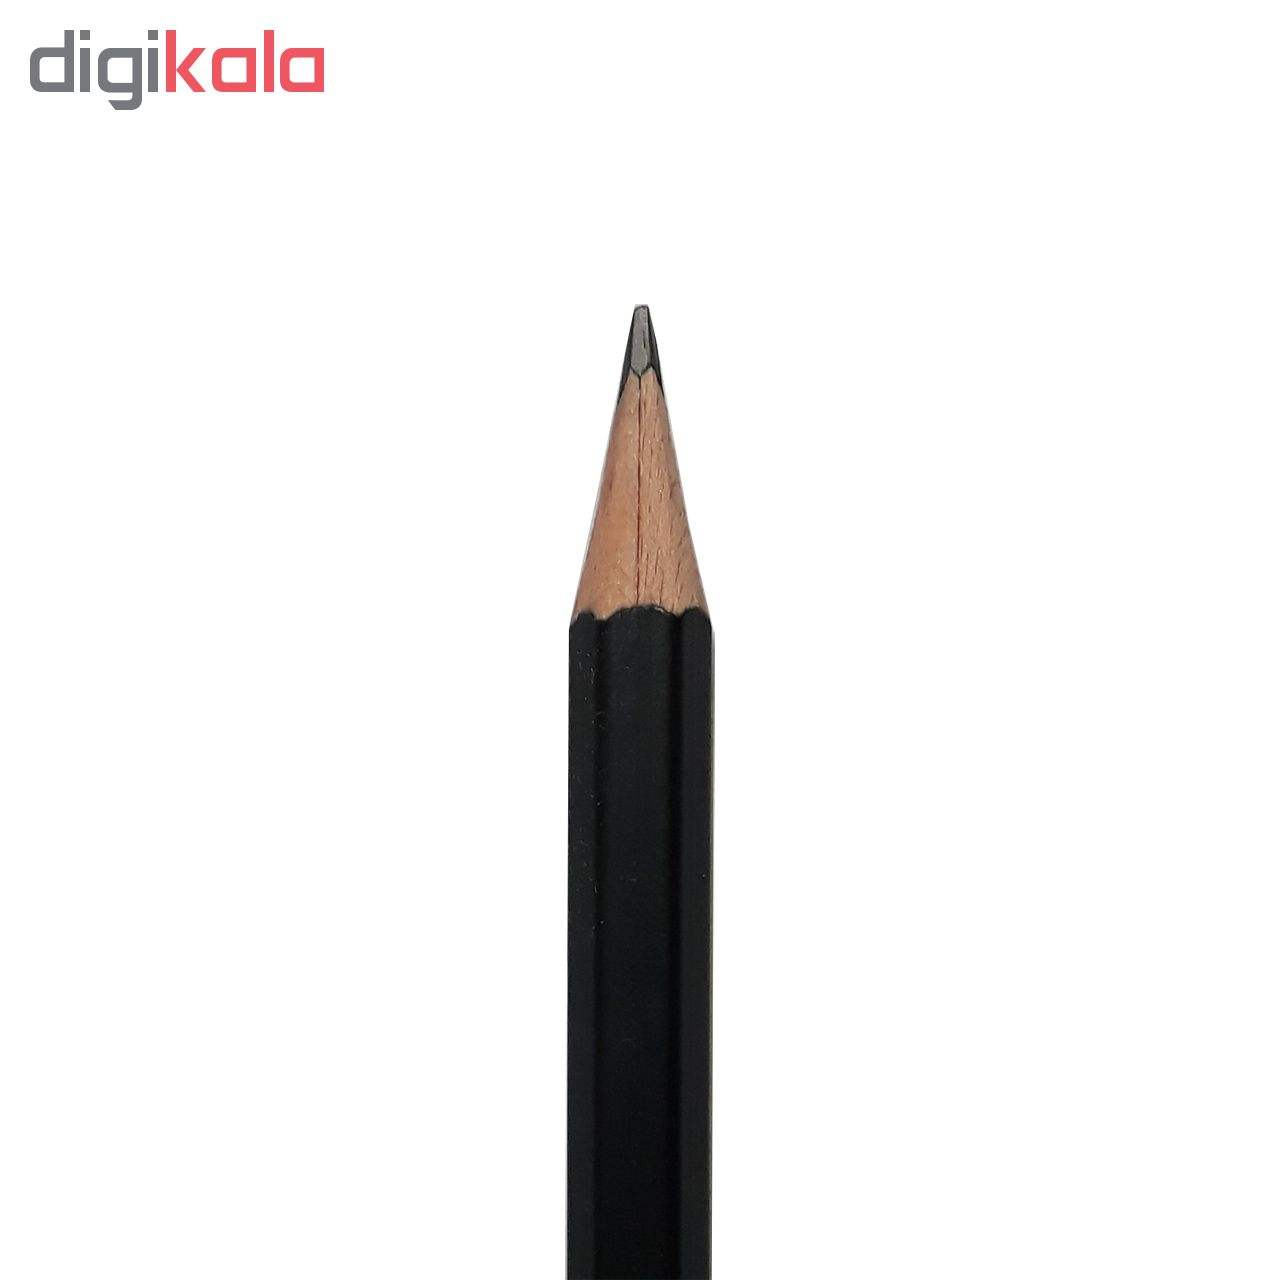 مداد مشکی پنتر مدل MULTI USE کد BP-104-3 بسته 12 عددی main 1 5